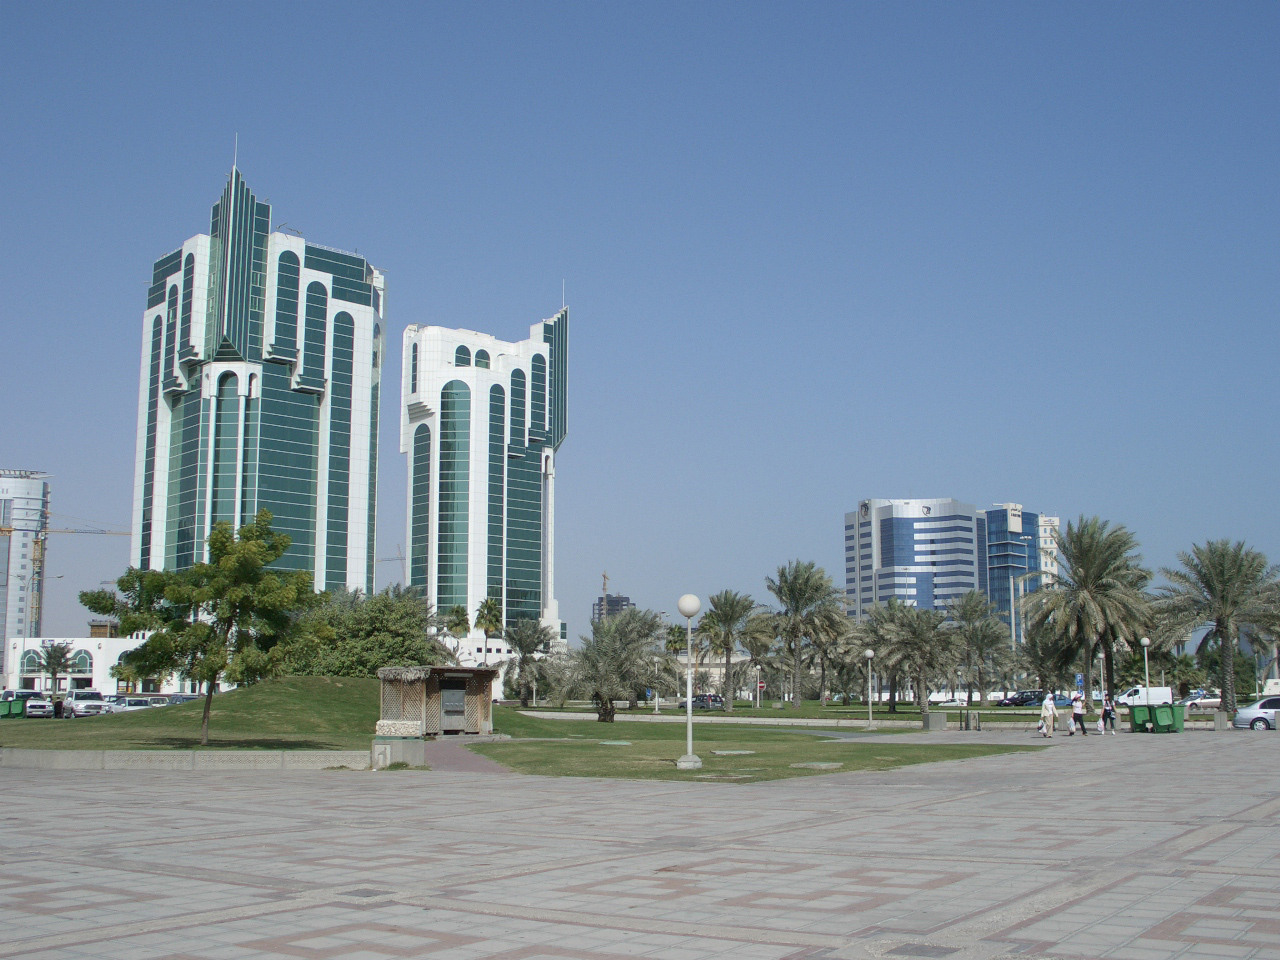 ����� ���, �������� ���,������ ���,qatar